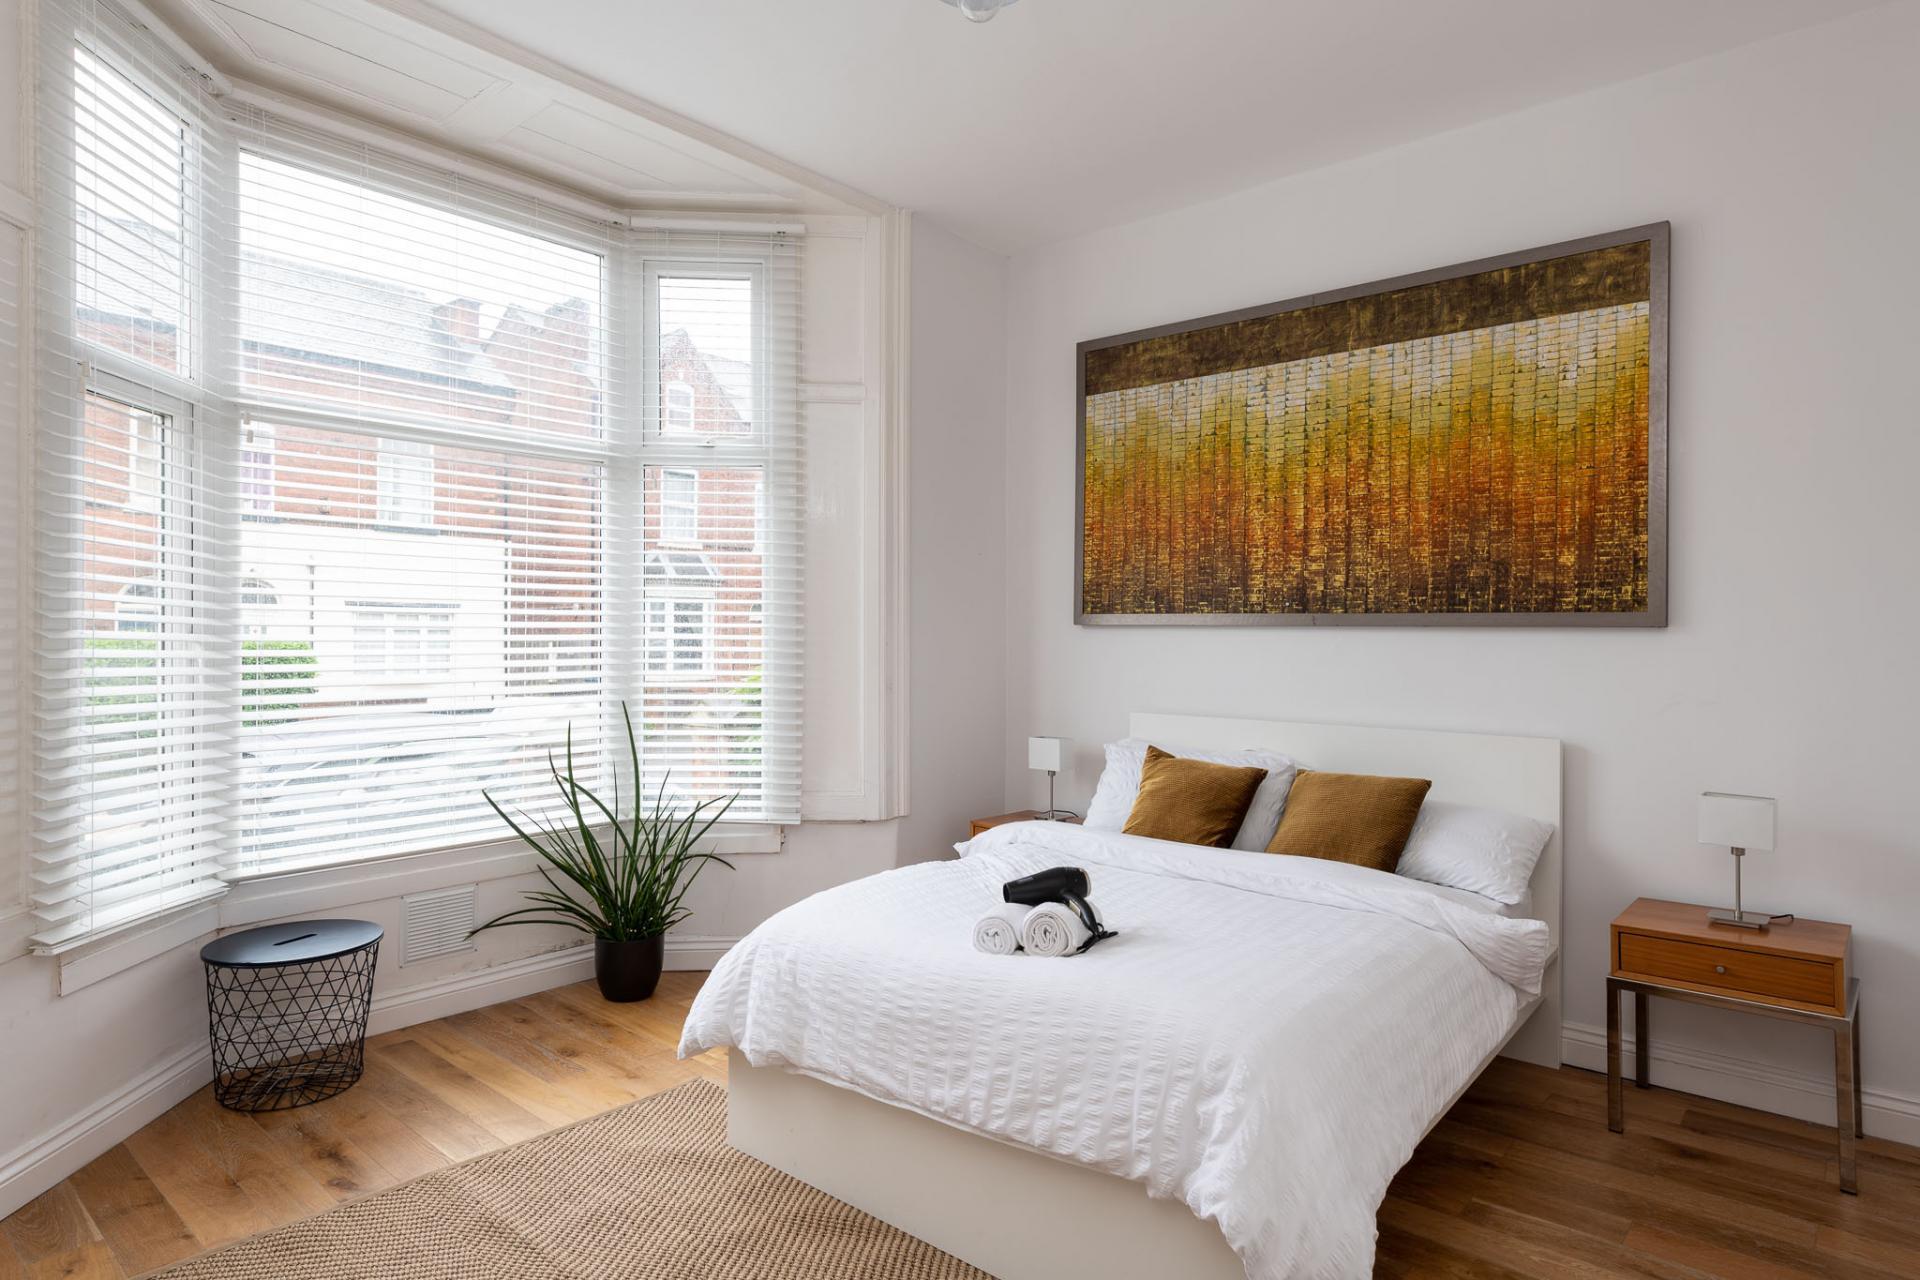 Ground Floor Flat at Edgbaston Apartments, Rotton Park, Birmingham - Citybase Apartments